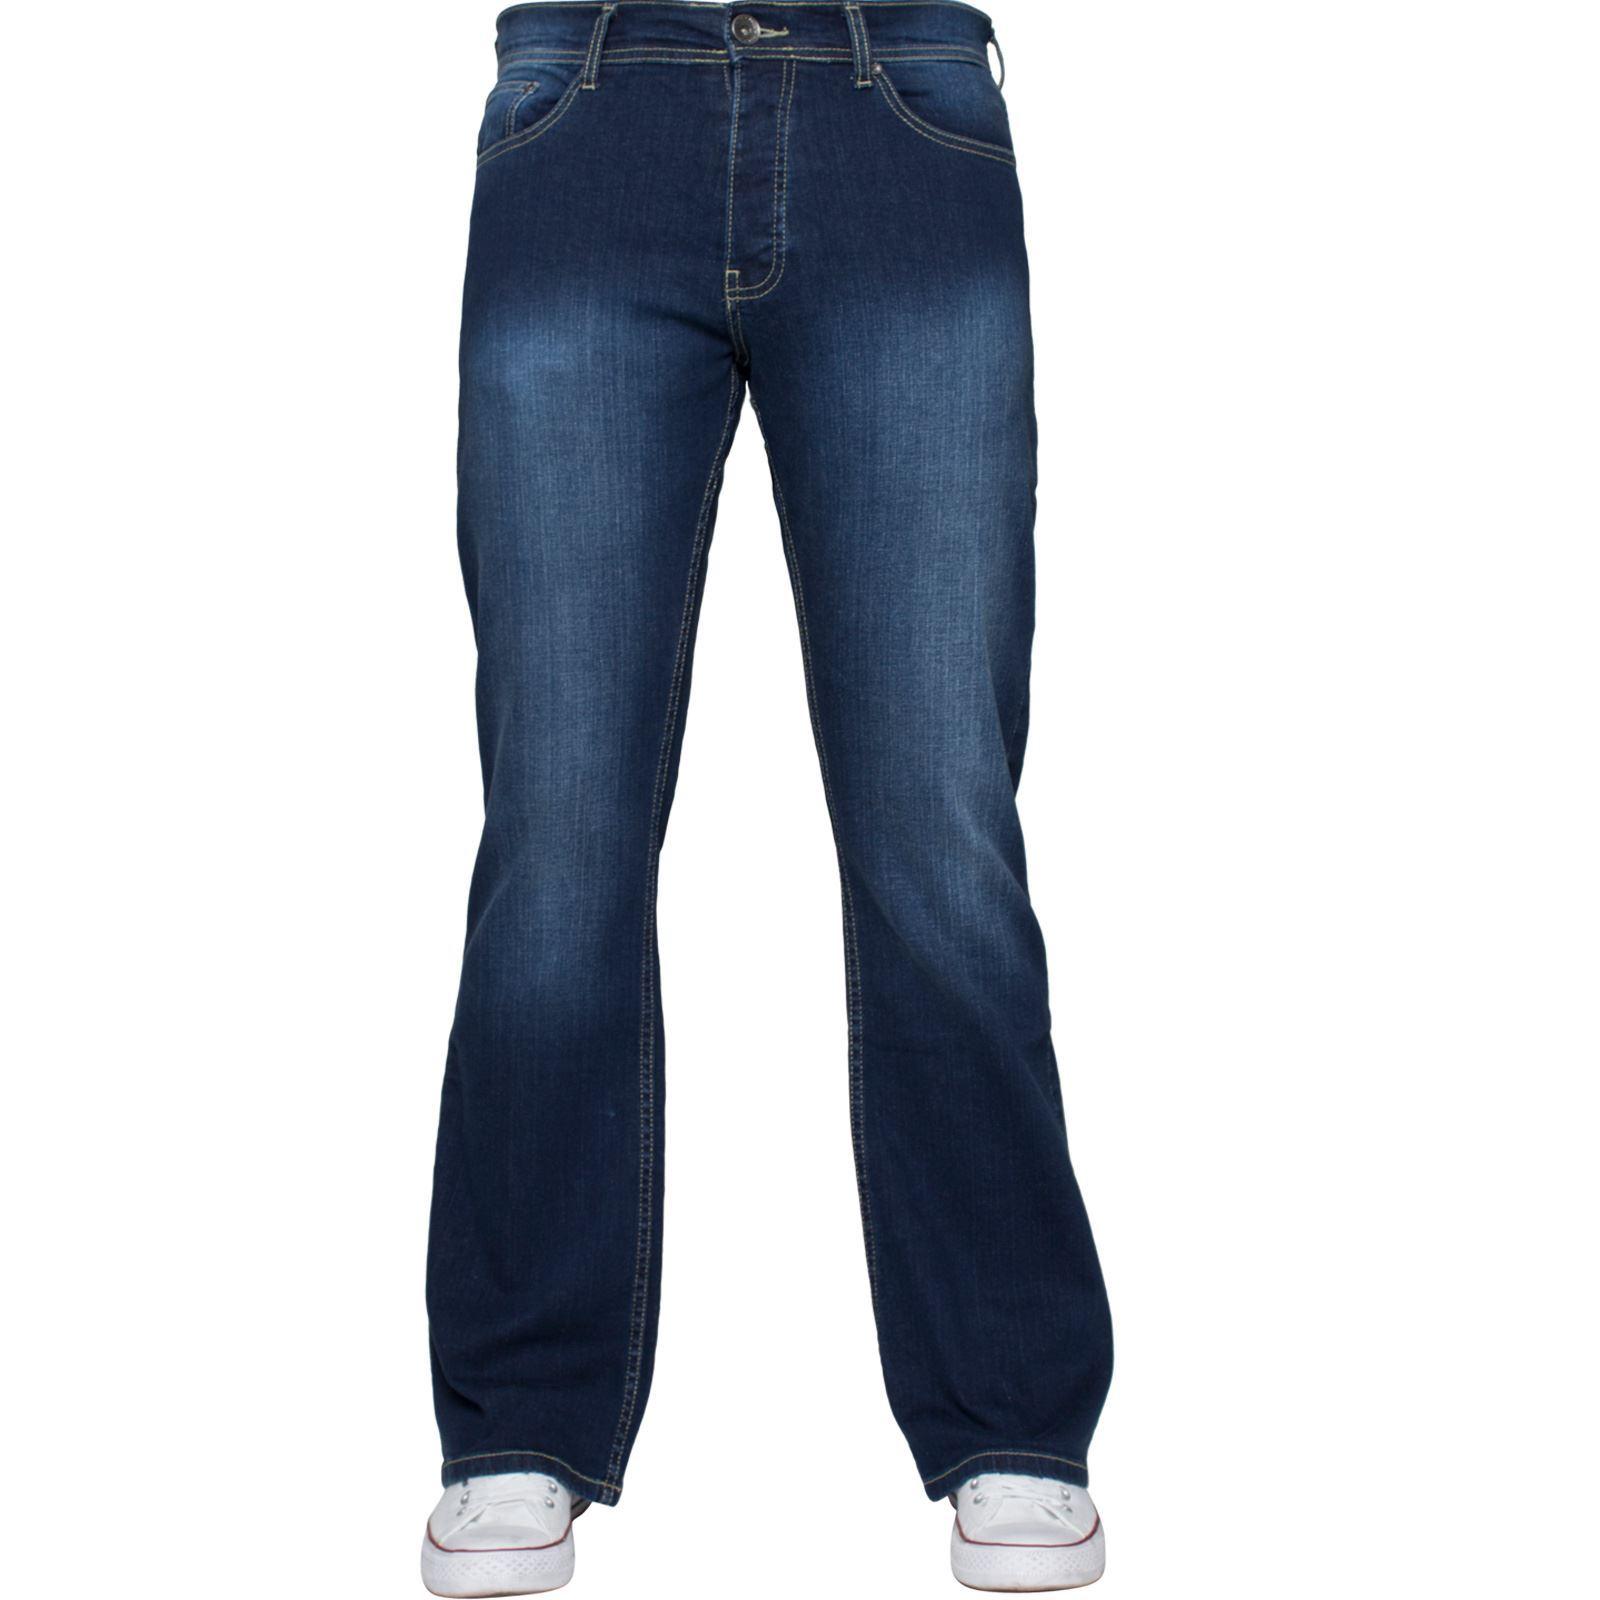 Para-Hombre-Recto-Bootcut-Stretch-Jeans-Pantalones-Regular-Fit-Grande-Alto-Todas-Cinturas miniatura 30